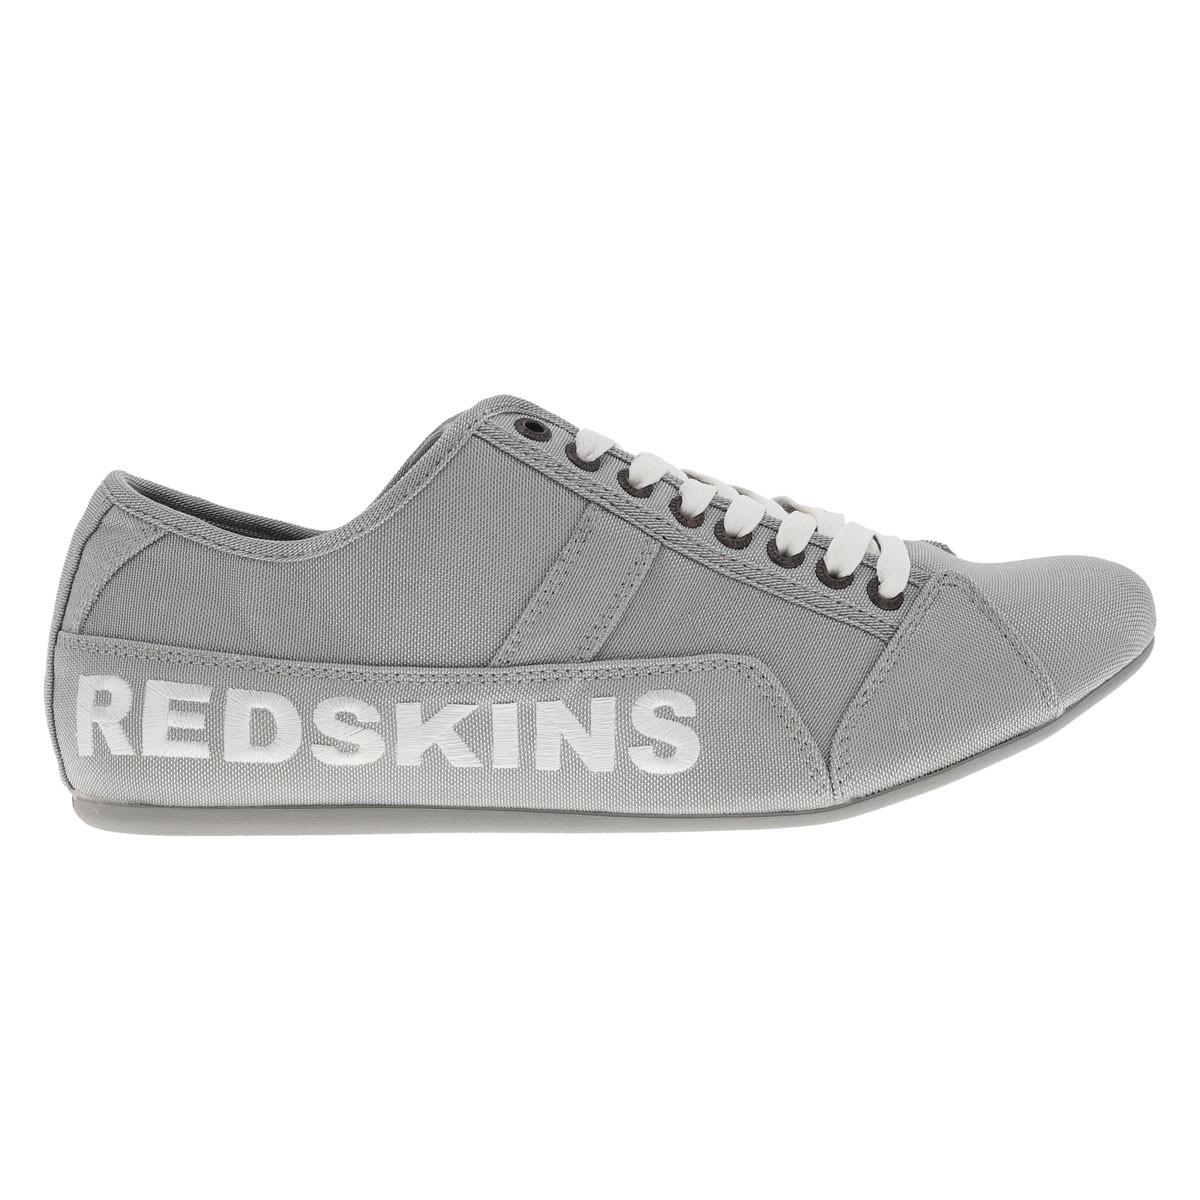 Baskets redskins guiz en mesh gris argenté